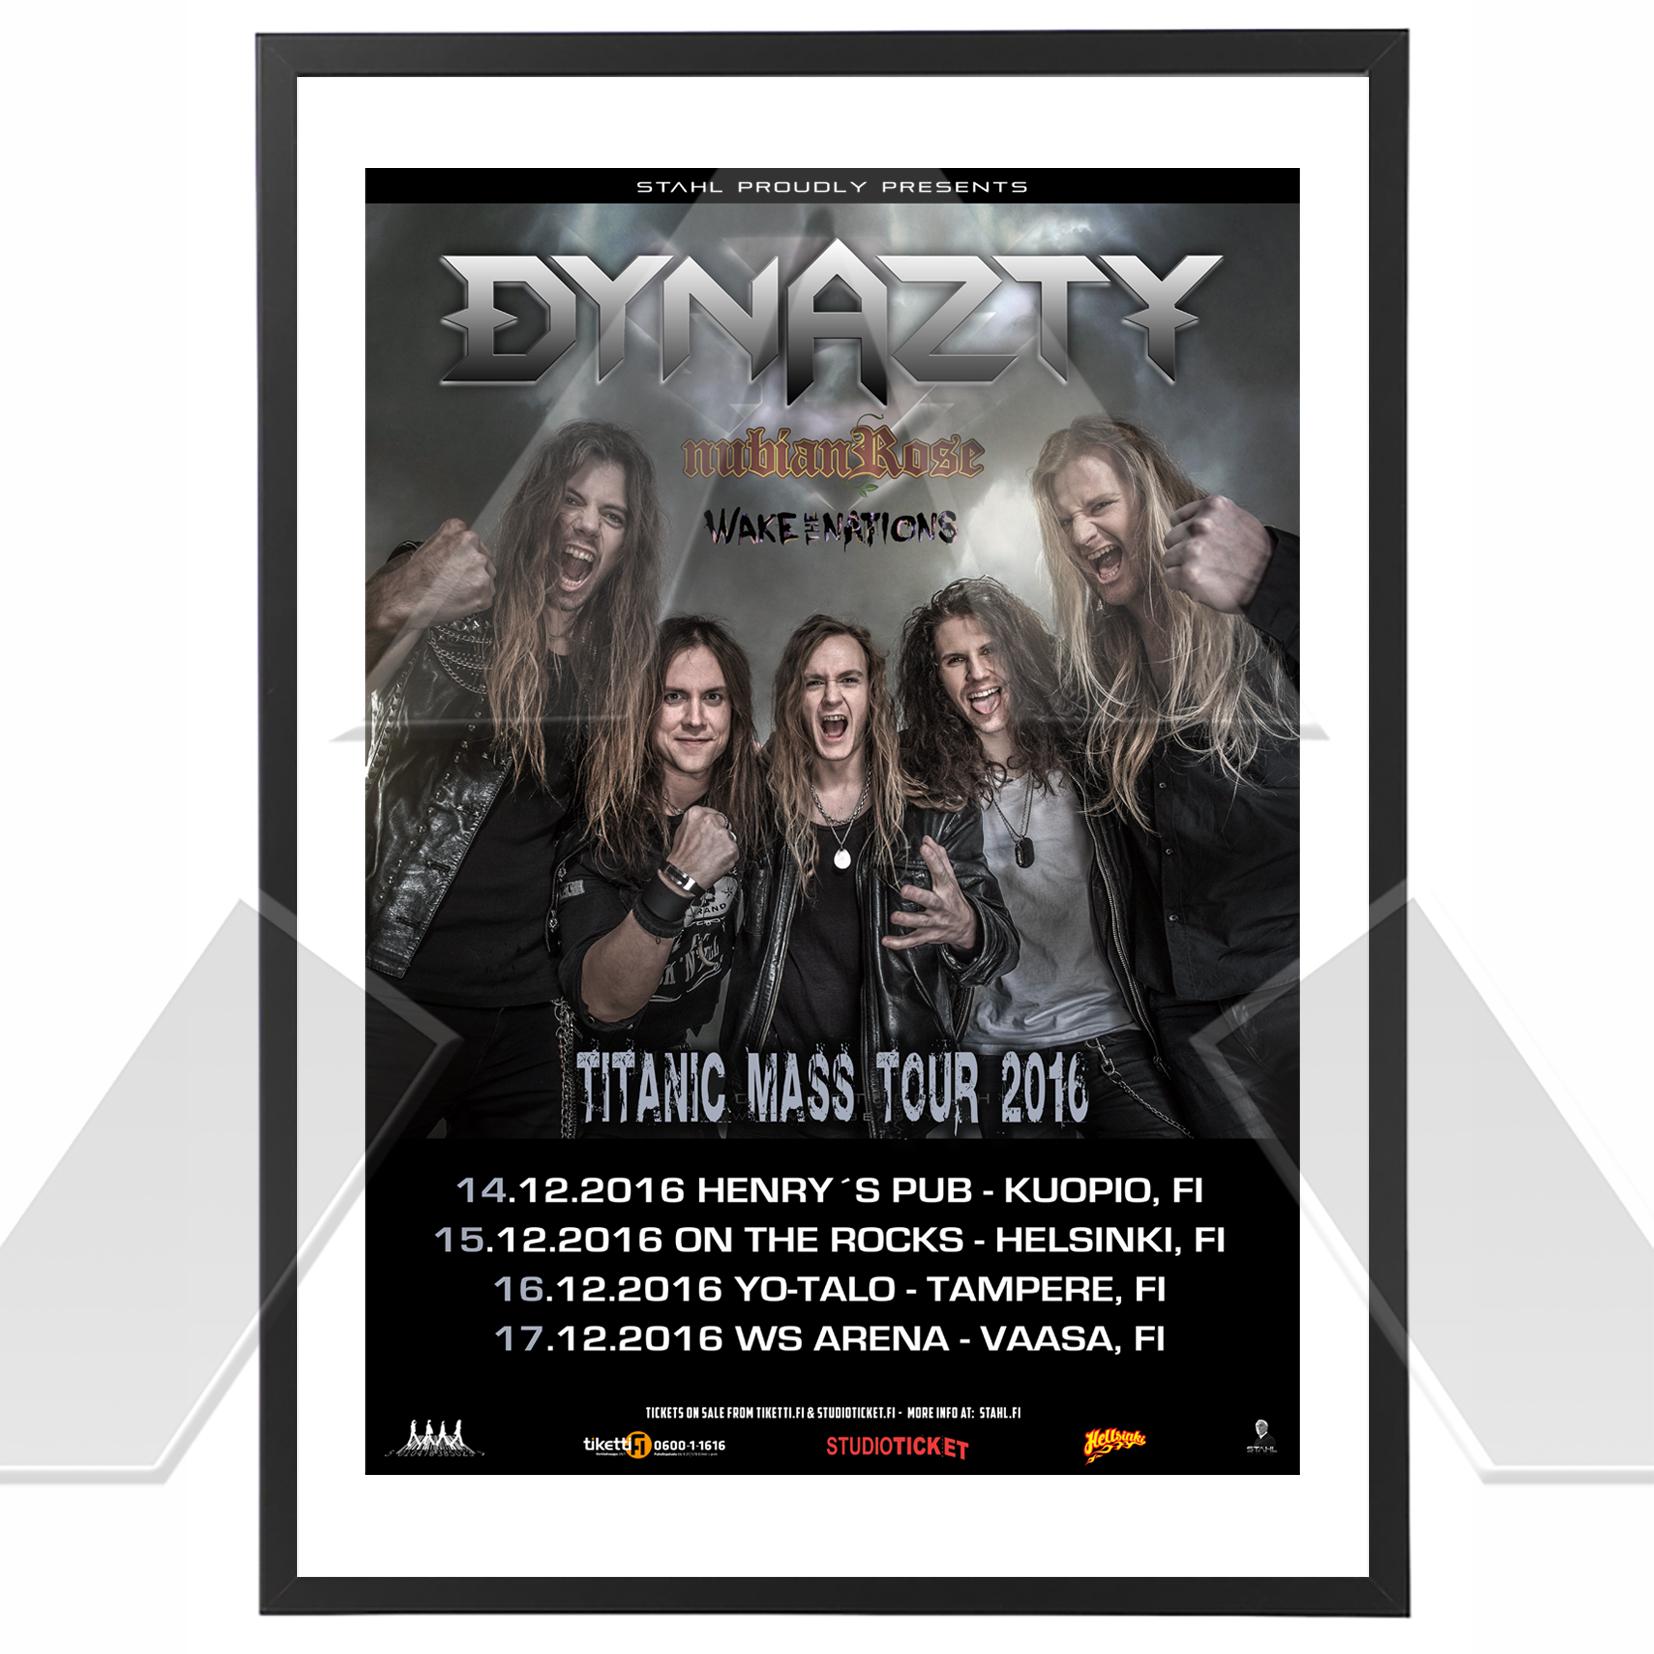 Dynazty ★ Titanic Mass Tour 2016 (tour poster)